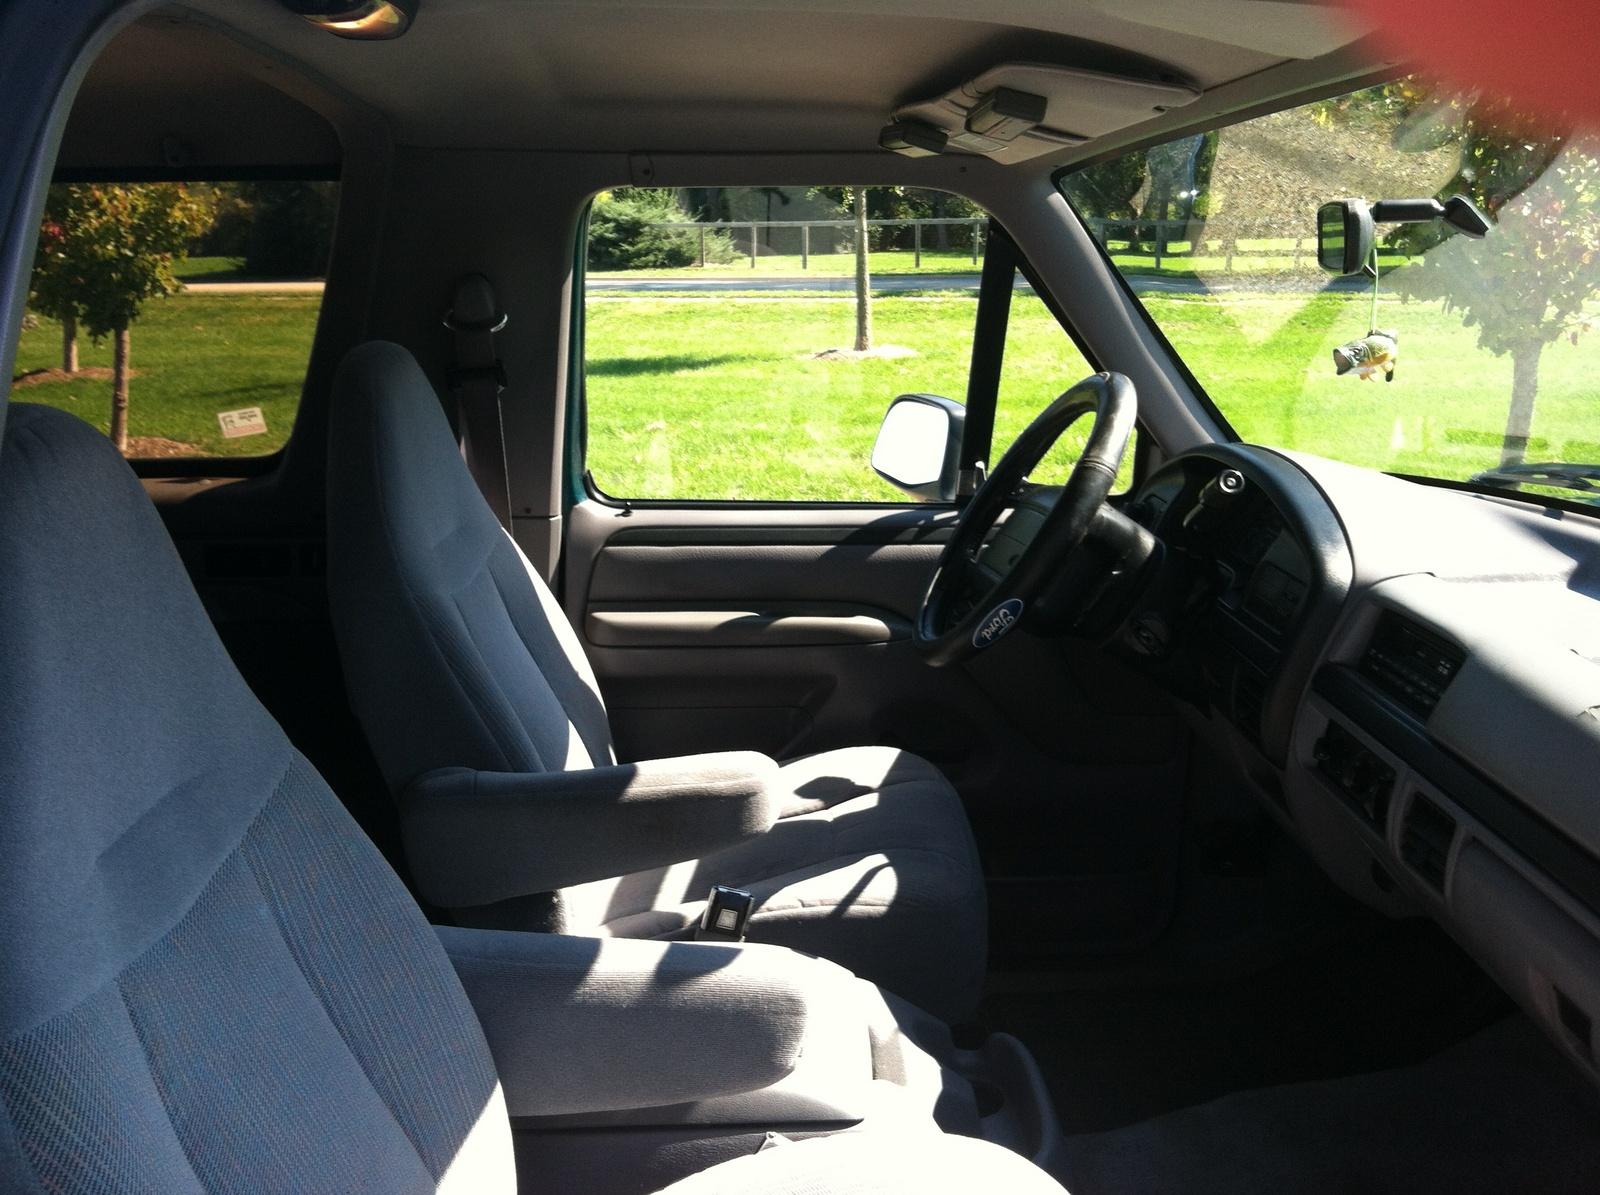 1996 Ford bronco interior